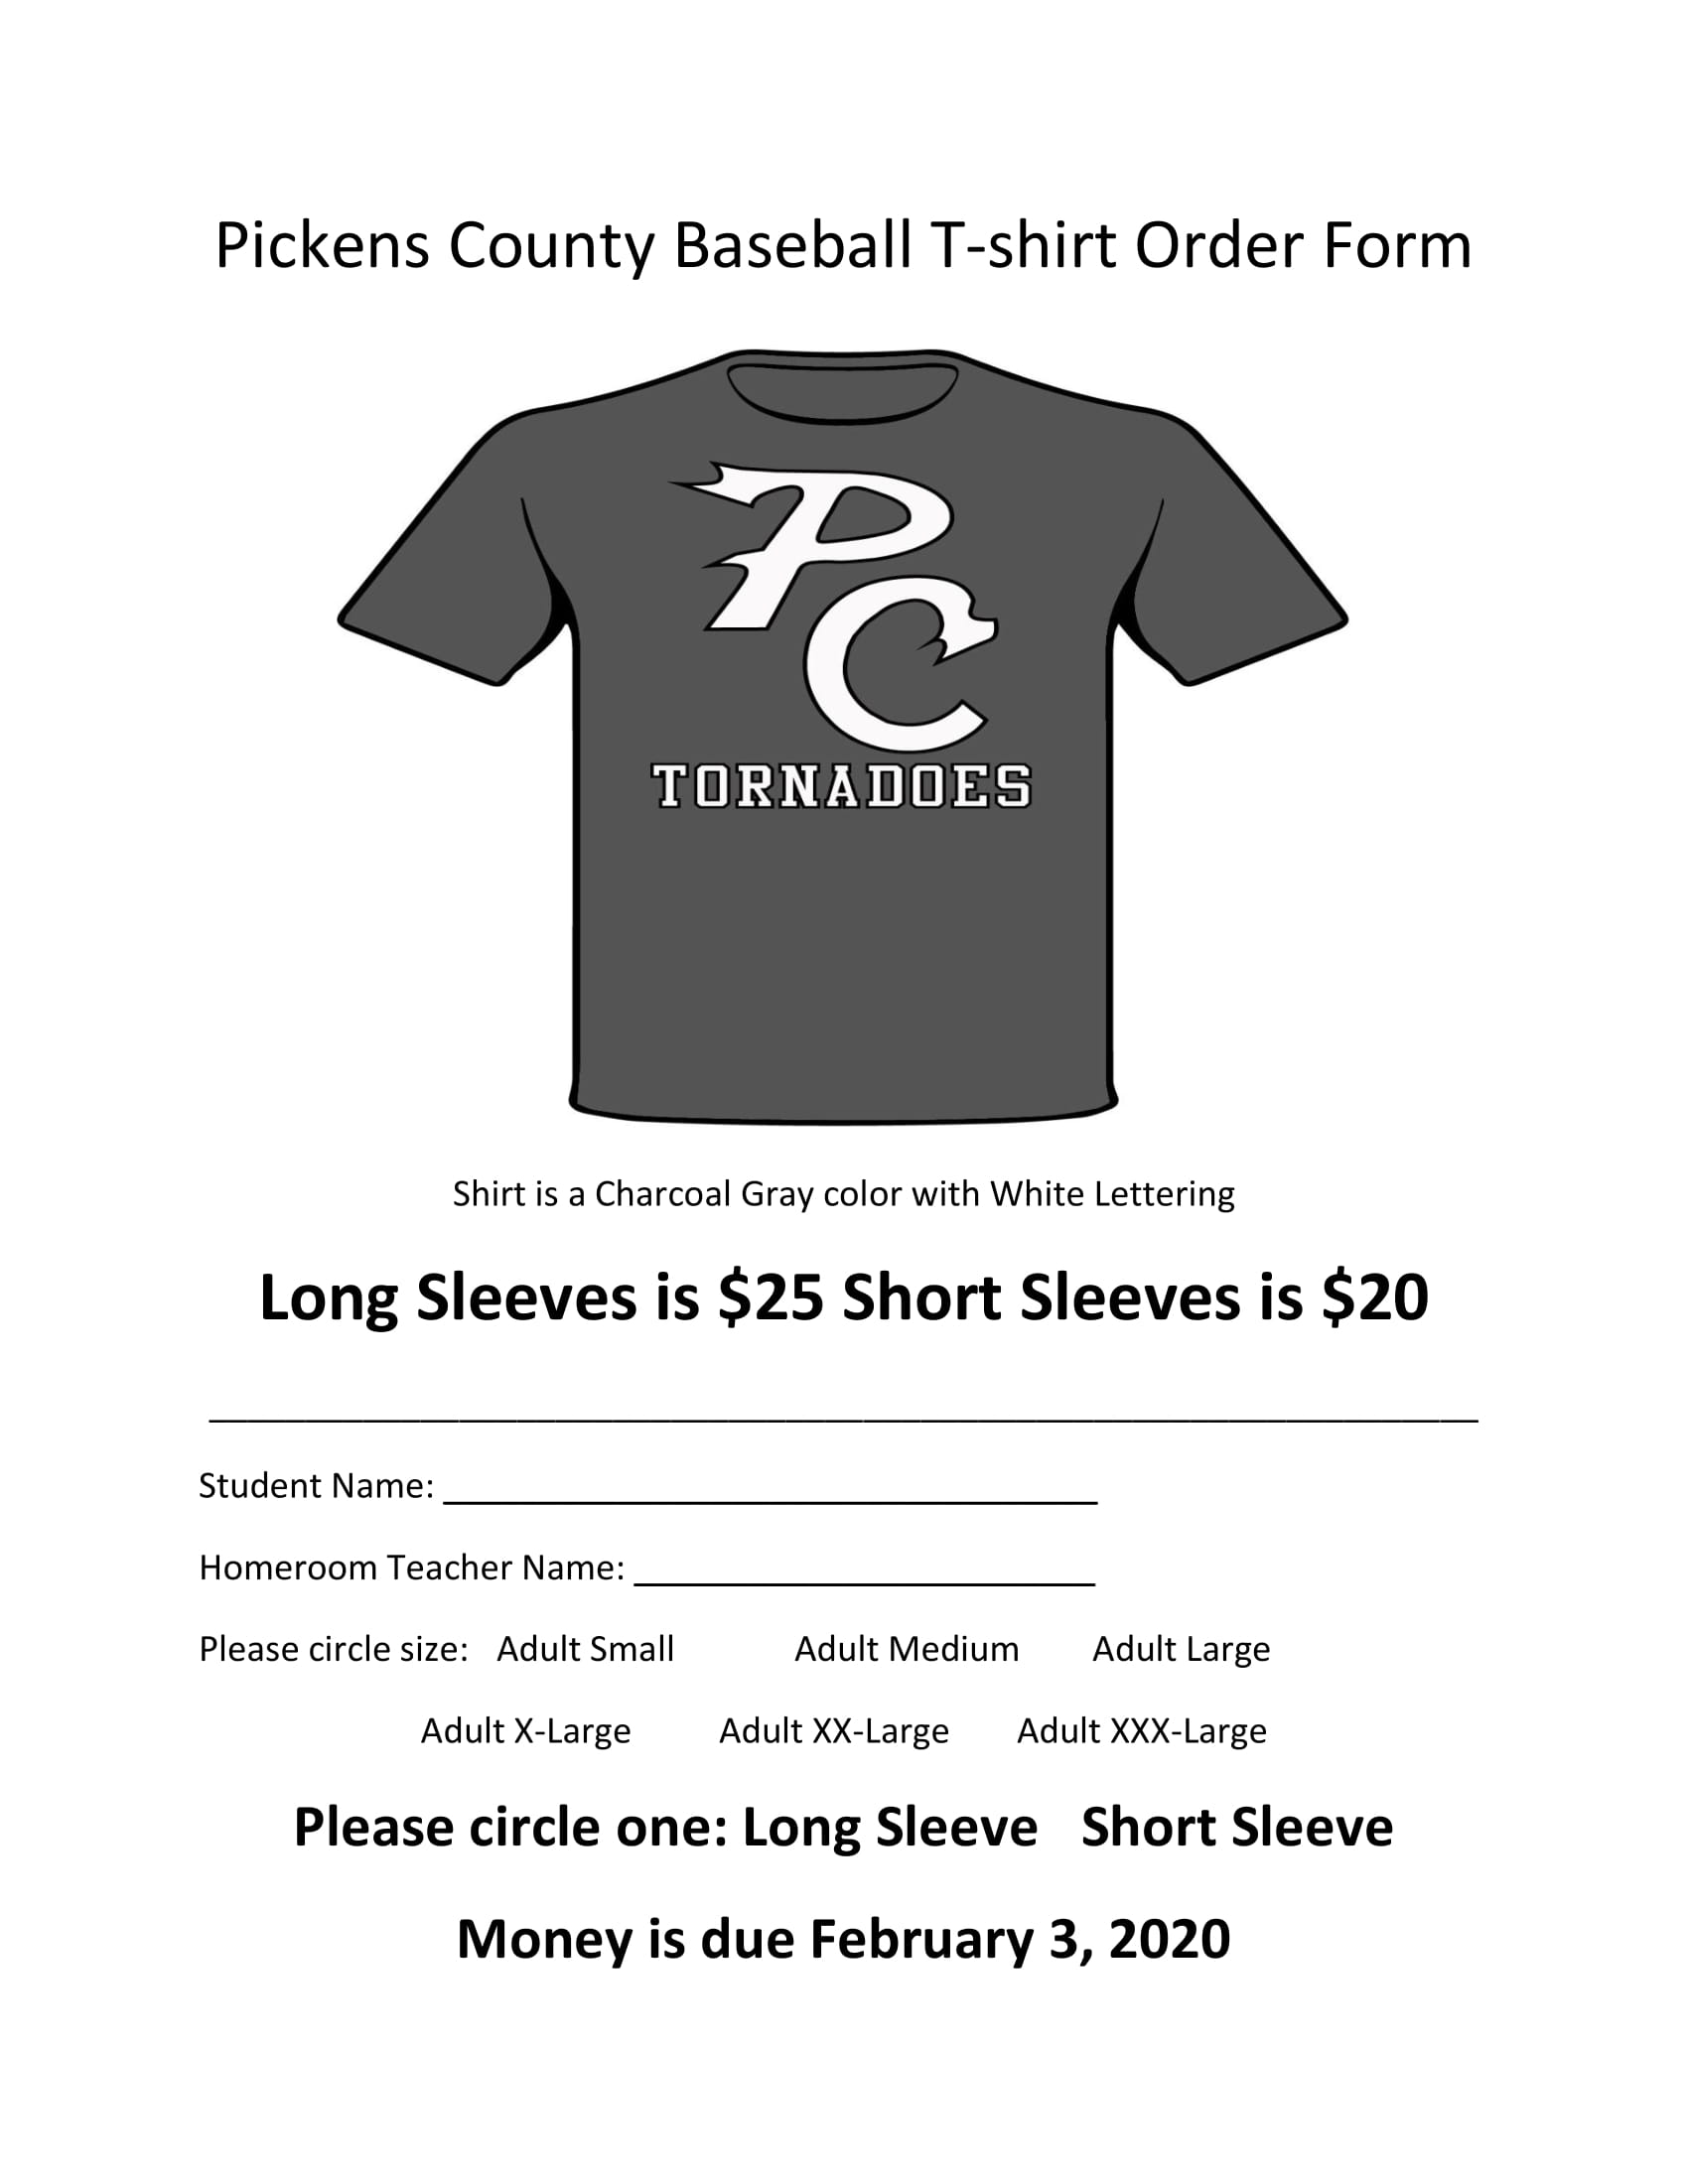 Baseball T-shirt Order Form